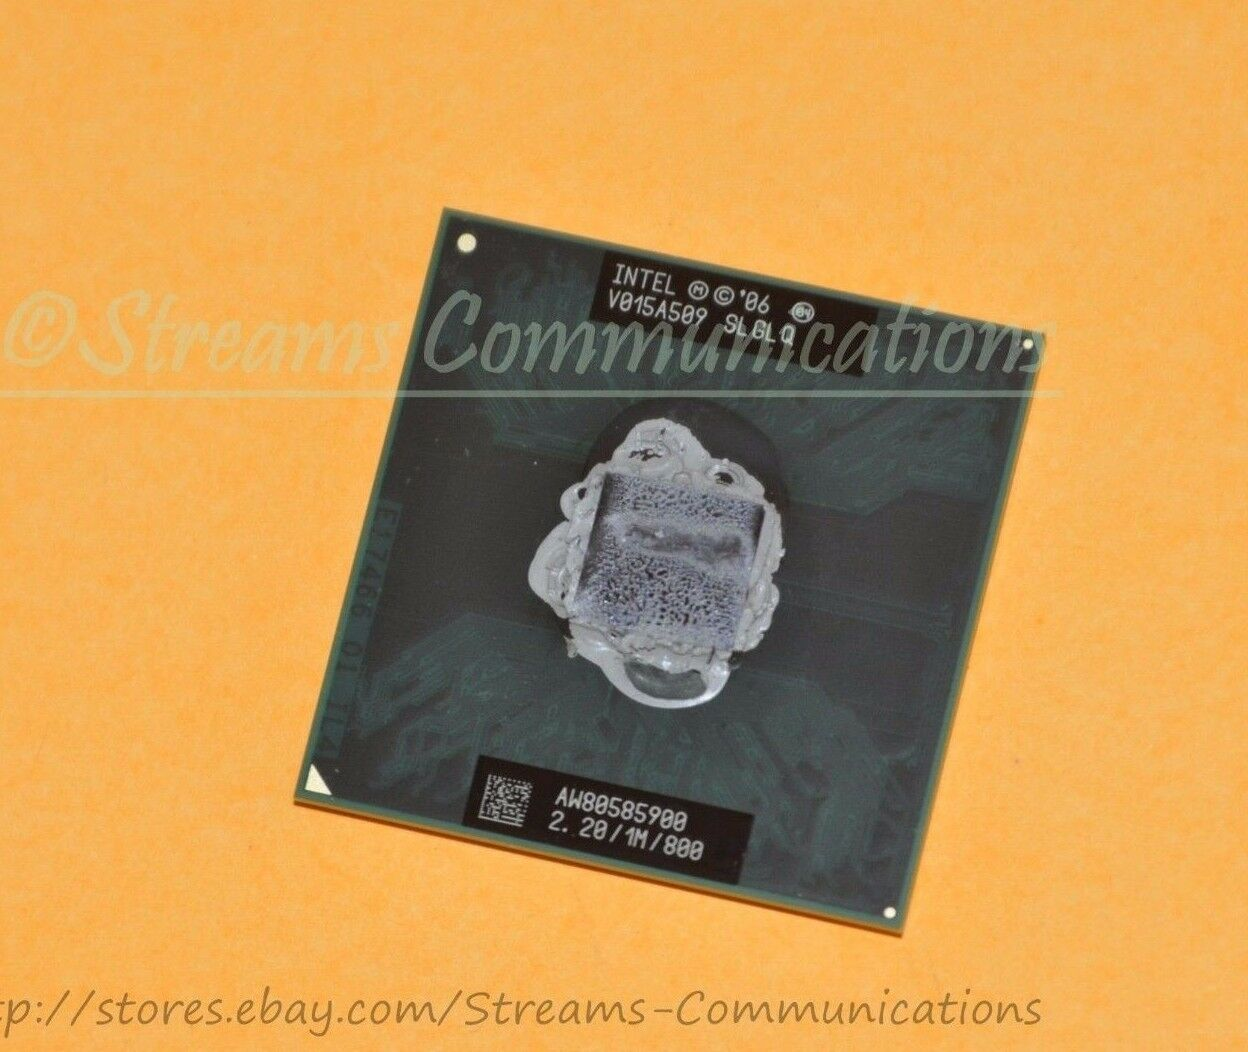 Compaq Presario CQNR Notebook PC drivers